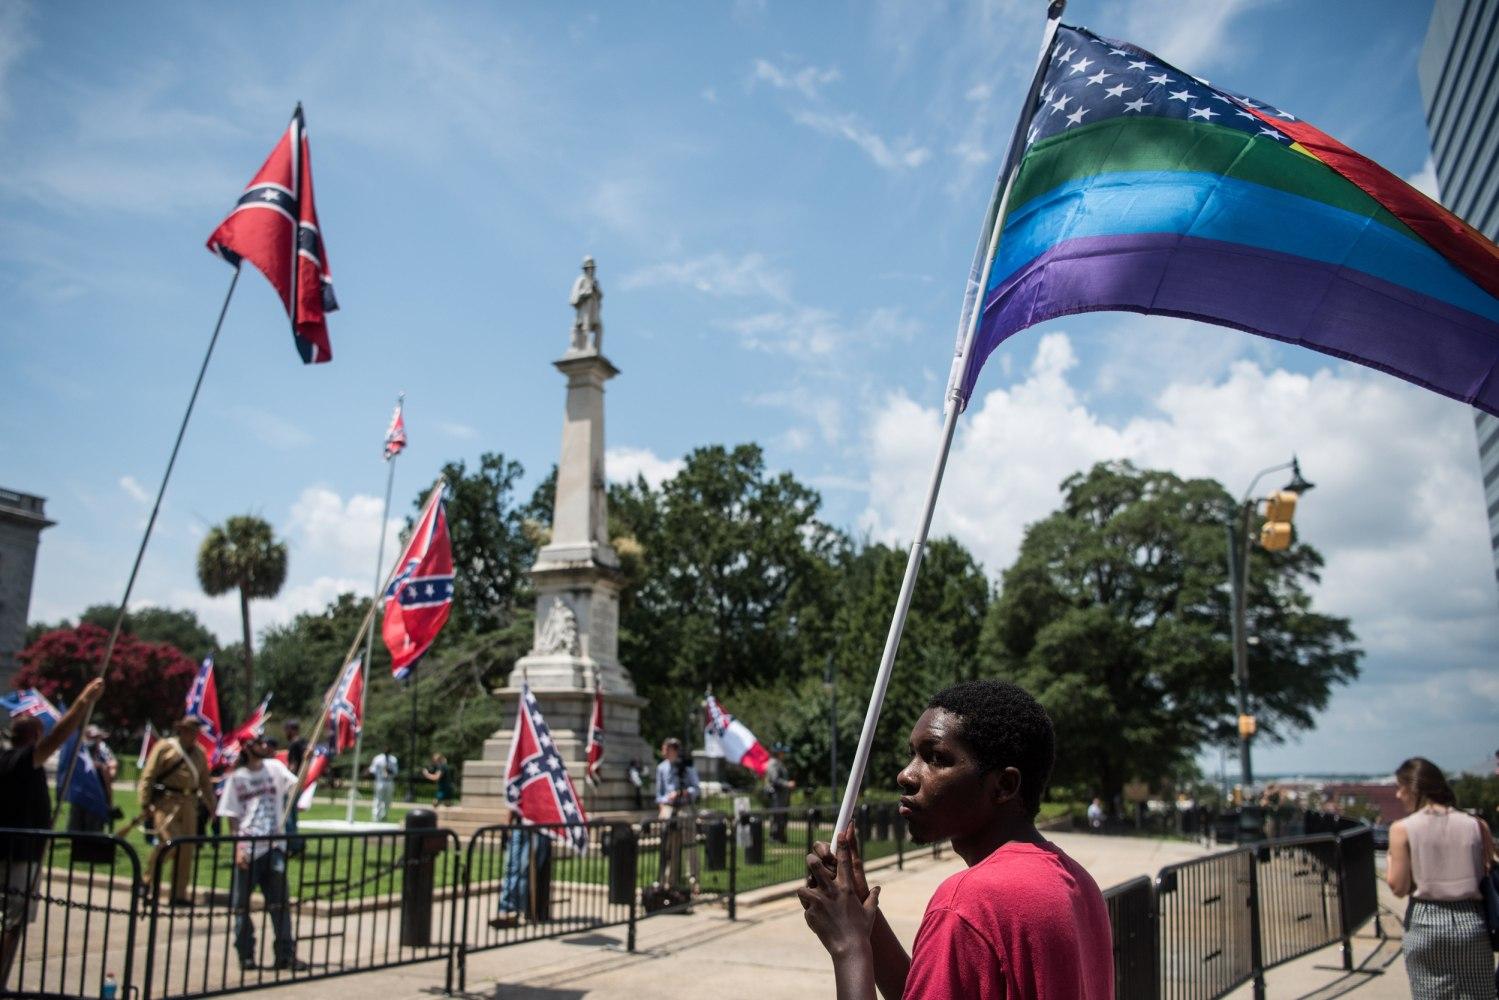 170710-confederate-flag-sc-raibnow-njs-441p_dfd37698c50a6918f5b1f0b869fd4187.nbcnews-ux-2880-1000.jpg